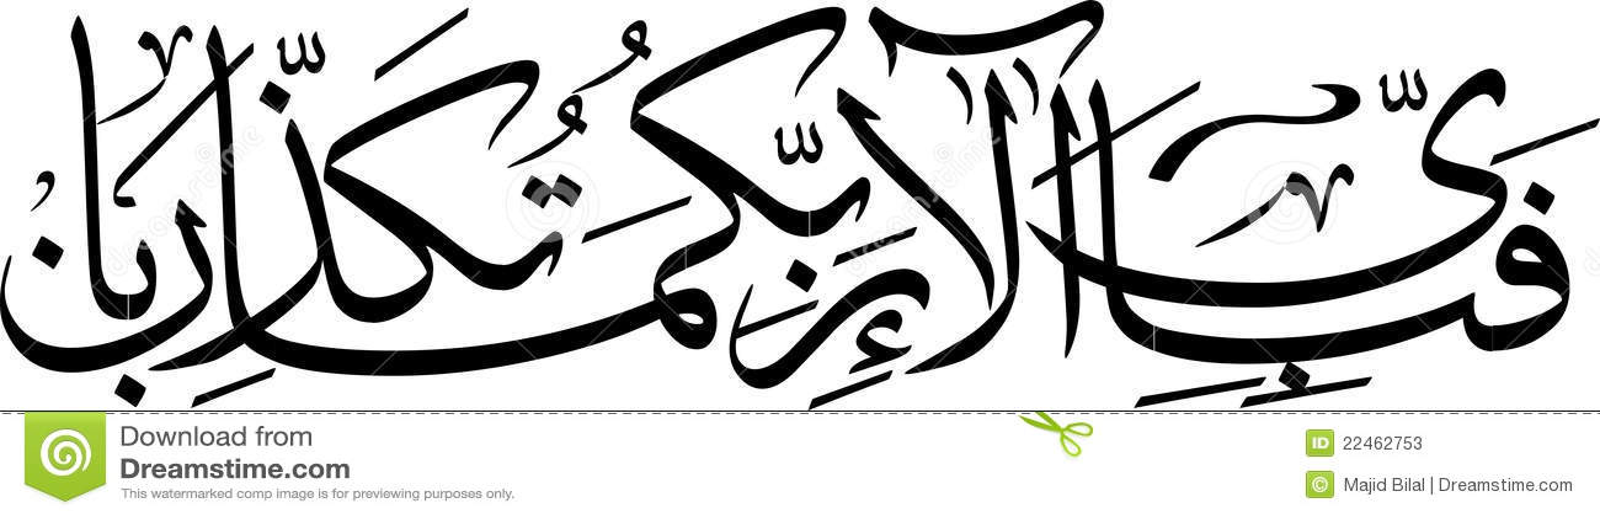 Arabic Calligraphy of Quranic Verse from Surah Rahman.